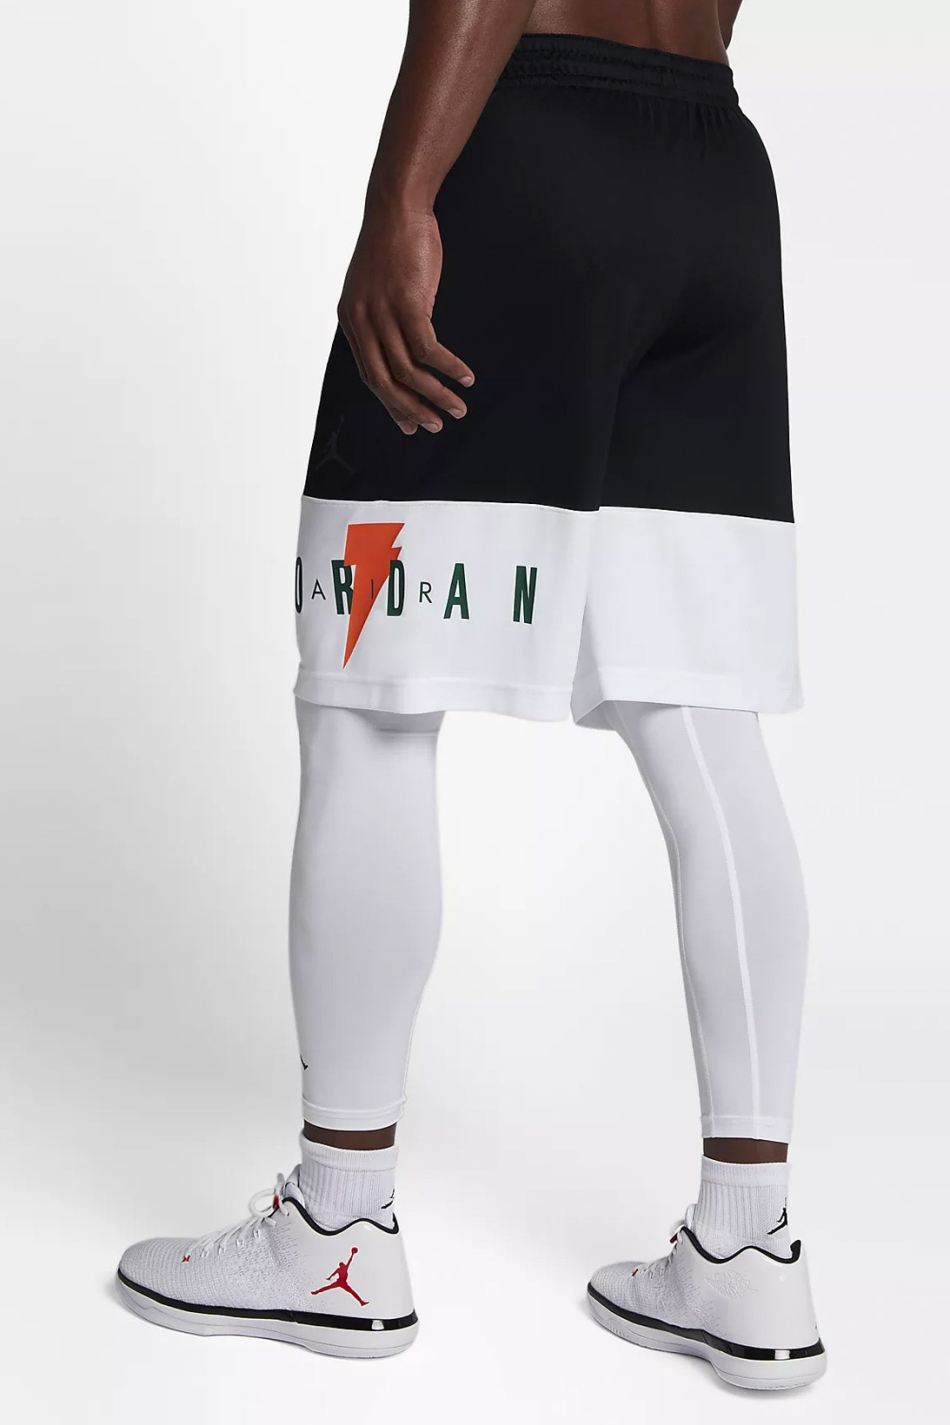 http3a2f2fhypebeast-com2fimage2f20172f112fnike-air-jordan-gatorade-apparel-collection-10